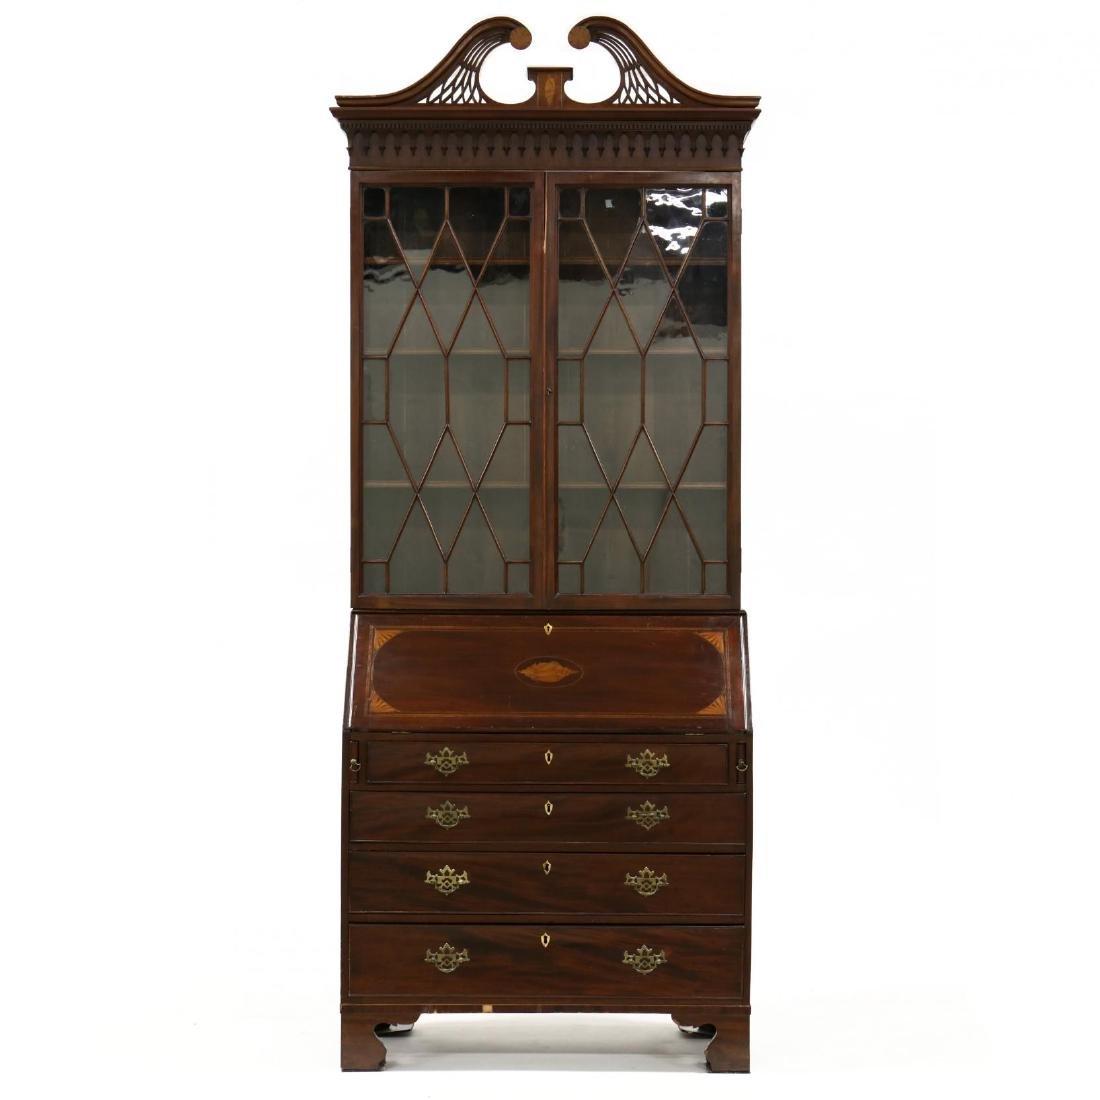 George III Inlaid Mahogany Secretary Bookcase